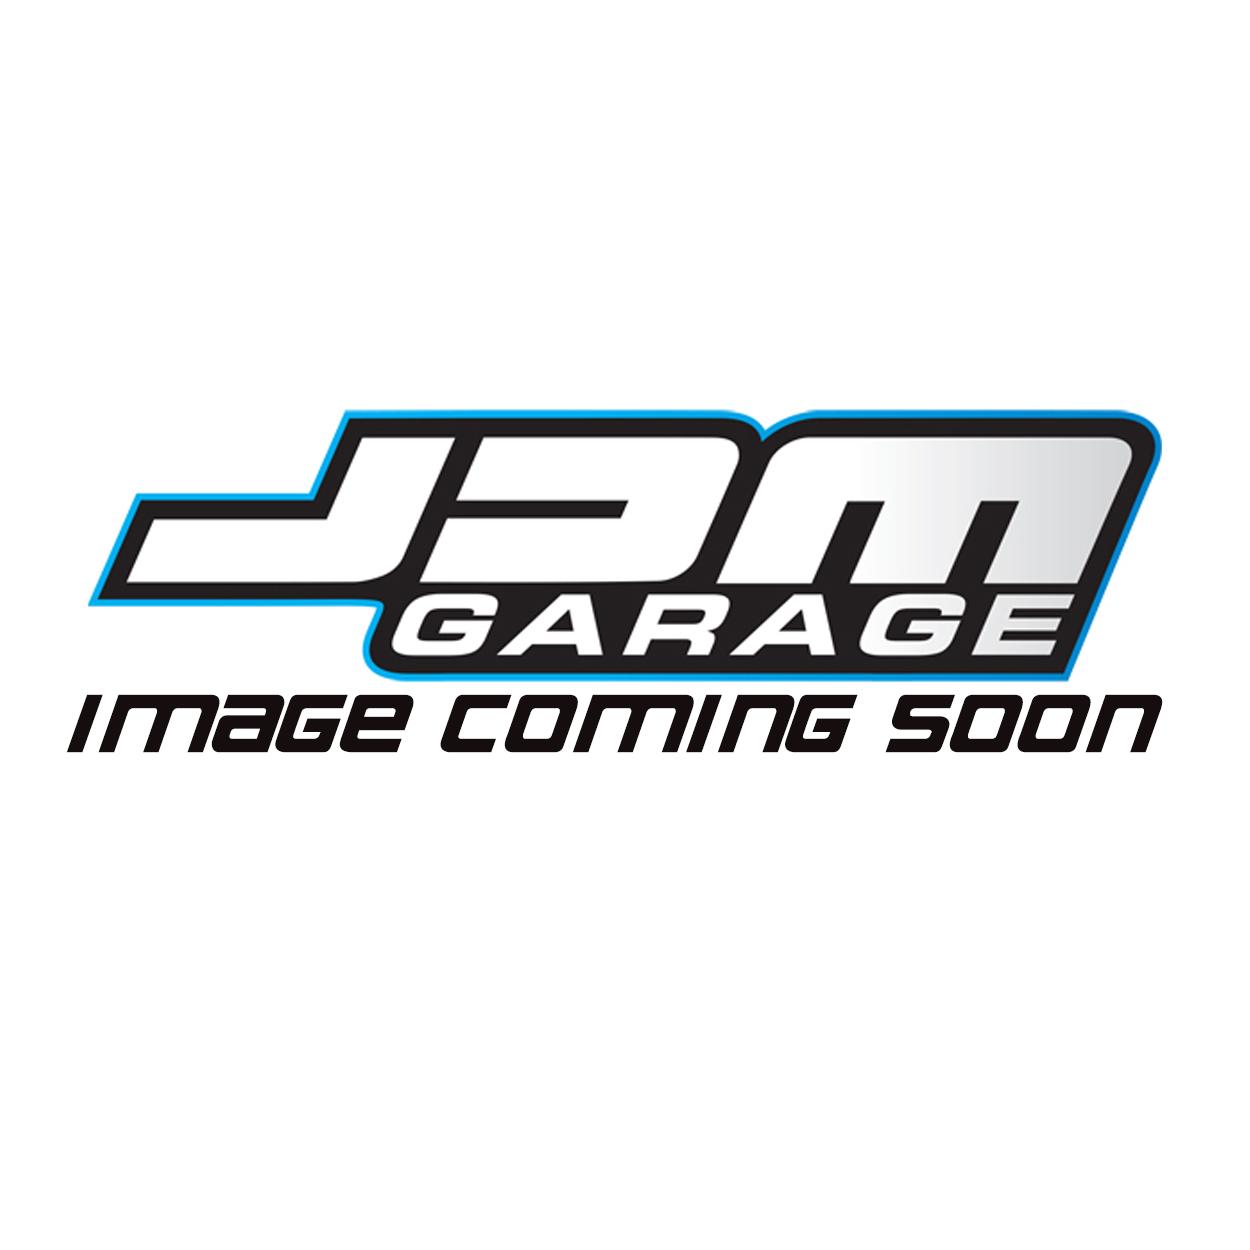 Genuine Nissan Timing Front Crank Guide Plate For Nissan Skyline R32 R33 GTST R34 GTT RB20 RB25DET Silvia S13 CA18DET 13023-42L00